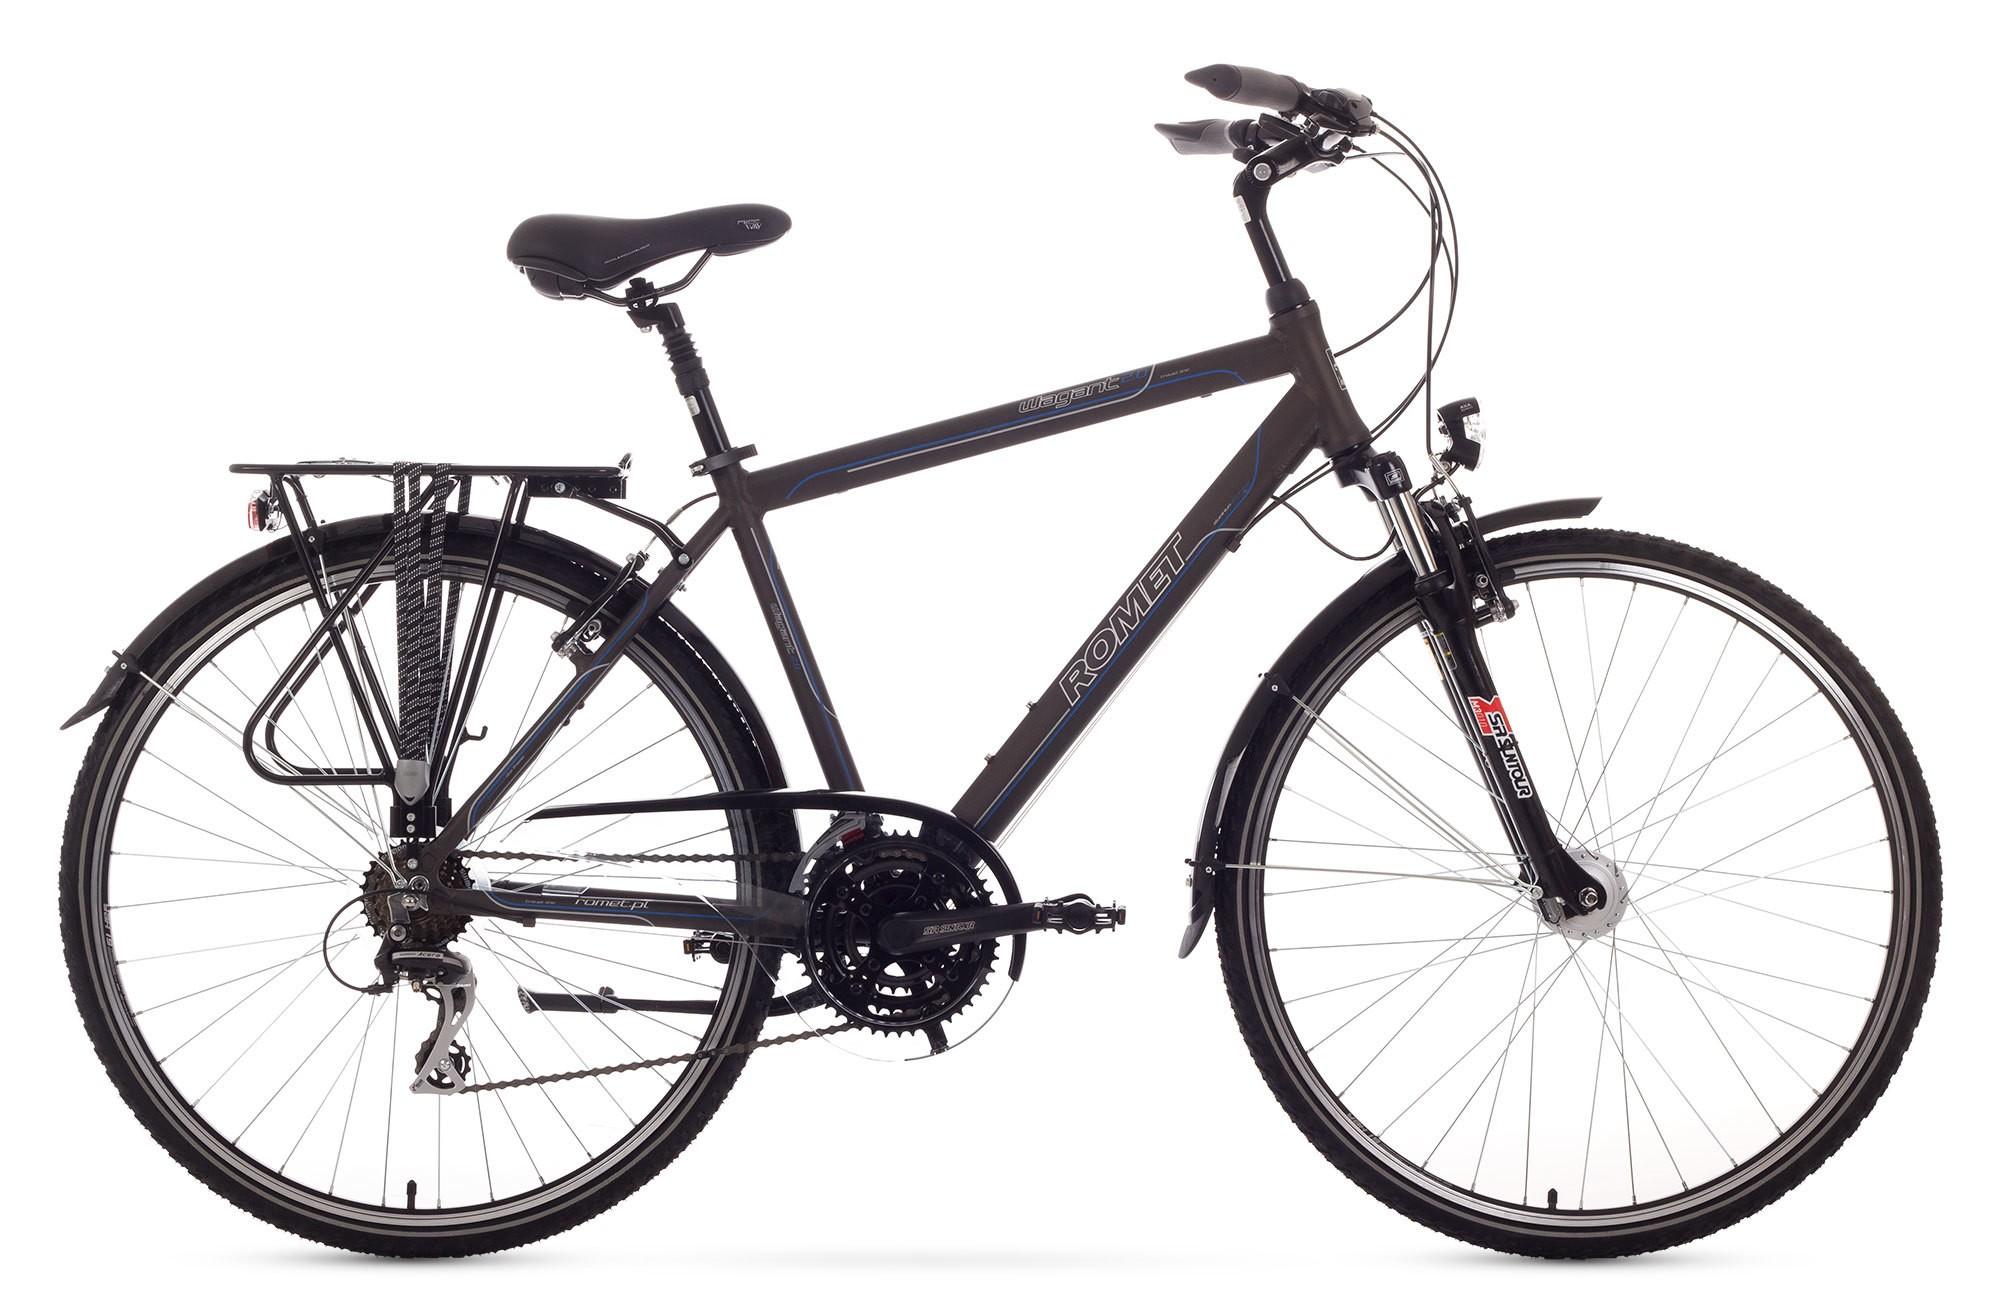 Bicicleta Trekking Romet Wagant 2.0 - grafit